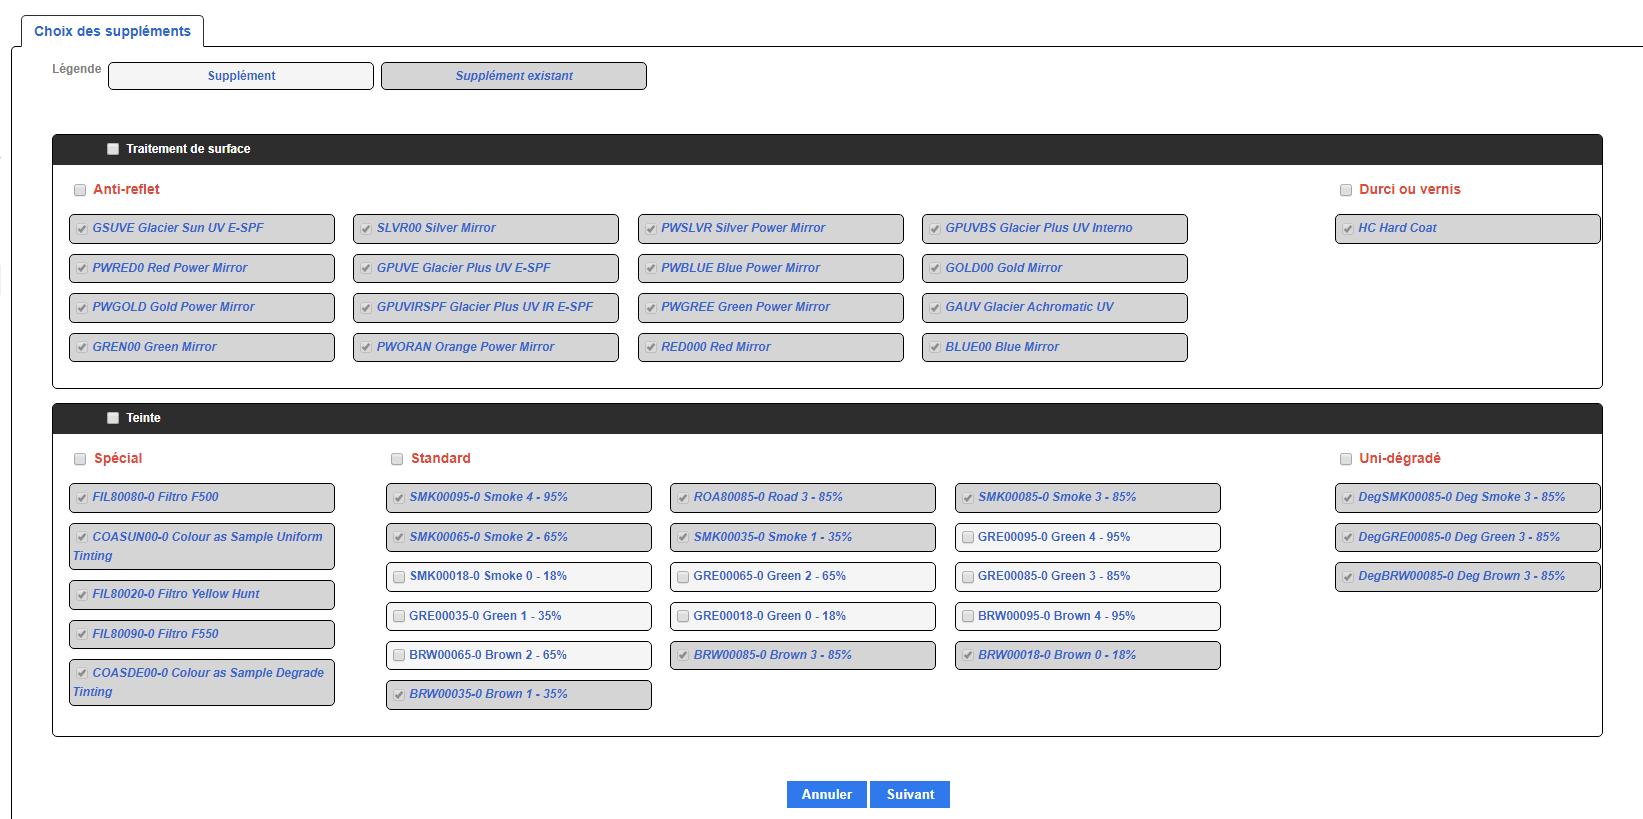 Exemple de choix d'options dans iWiCatalog, notre catalogue optique international